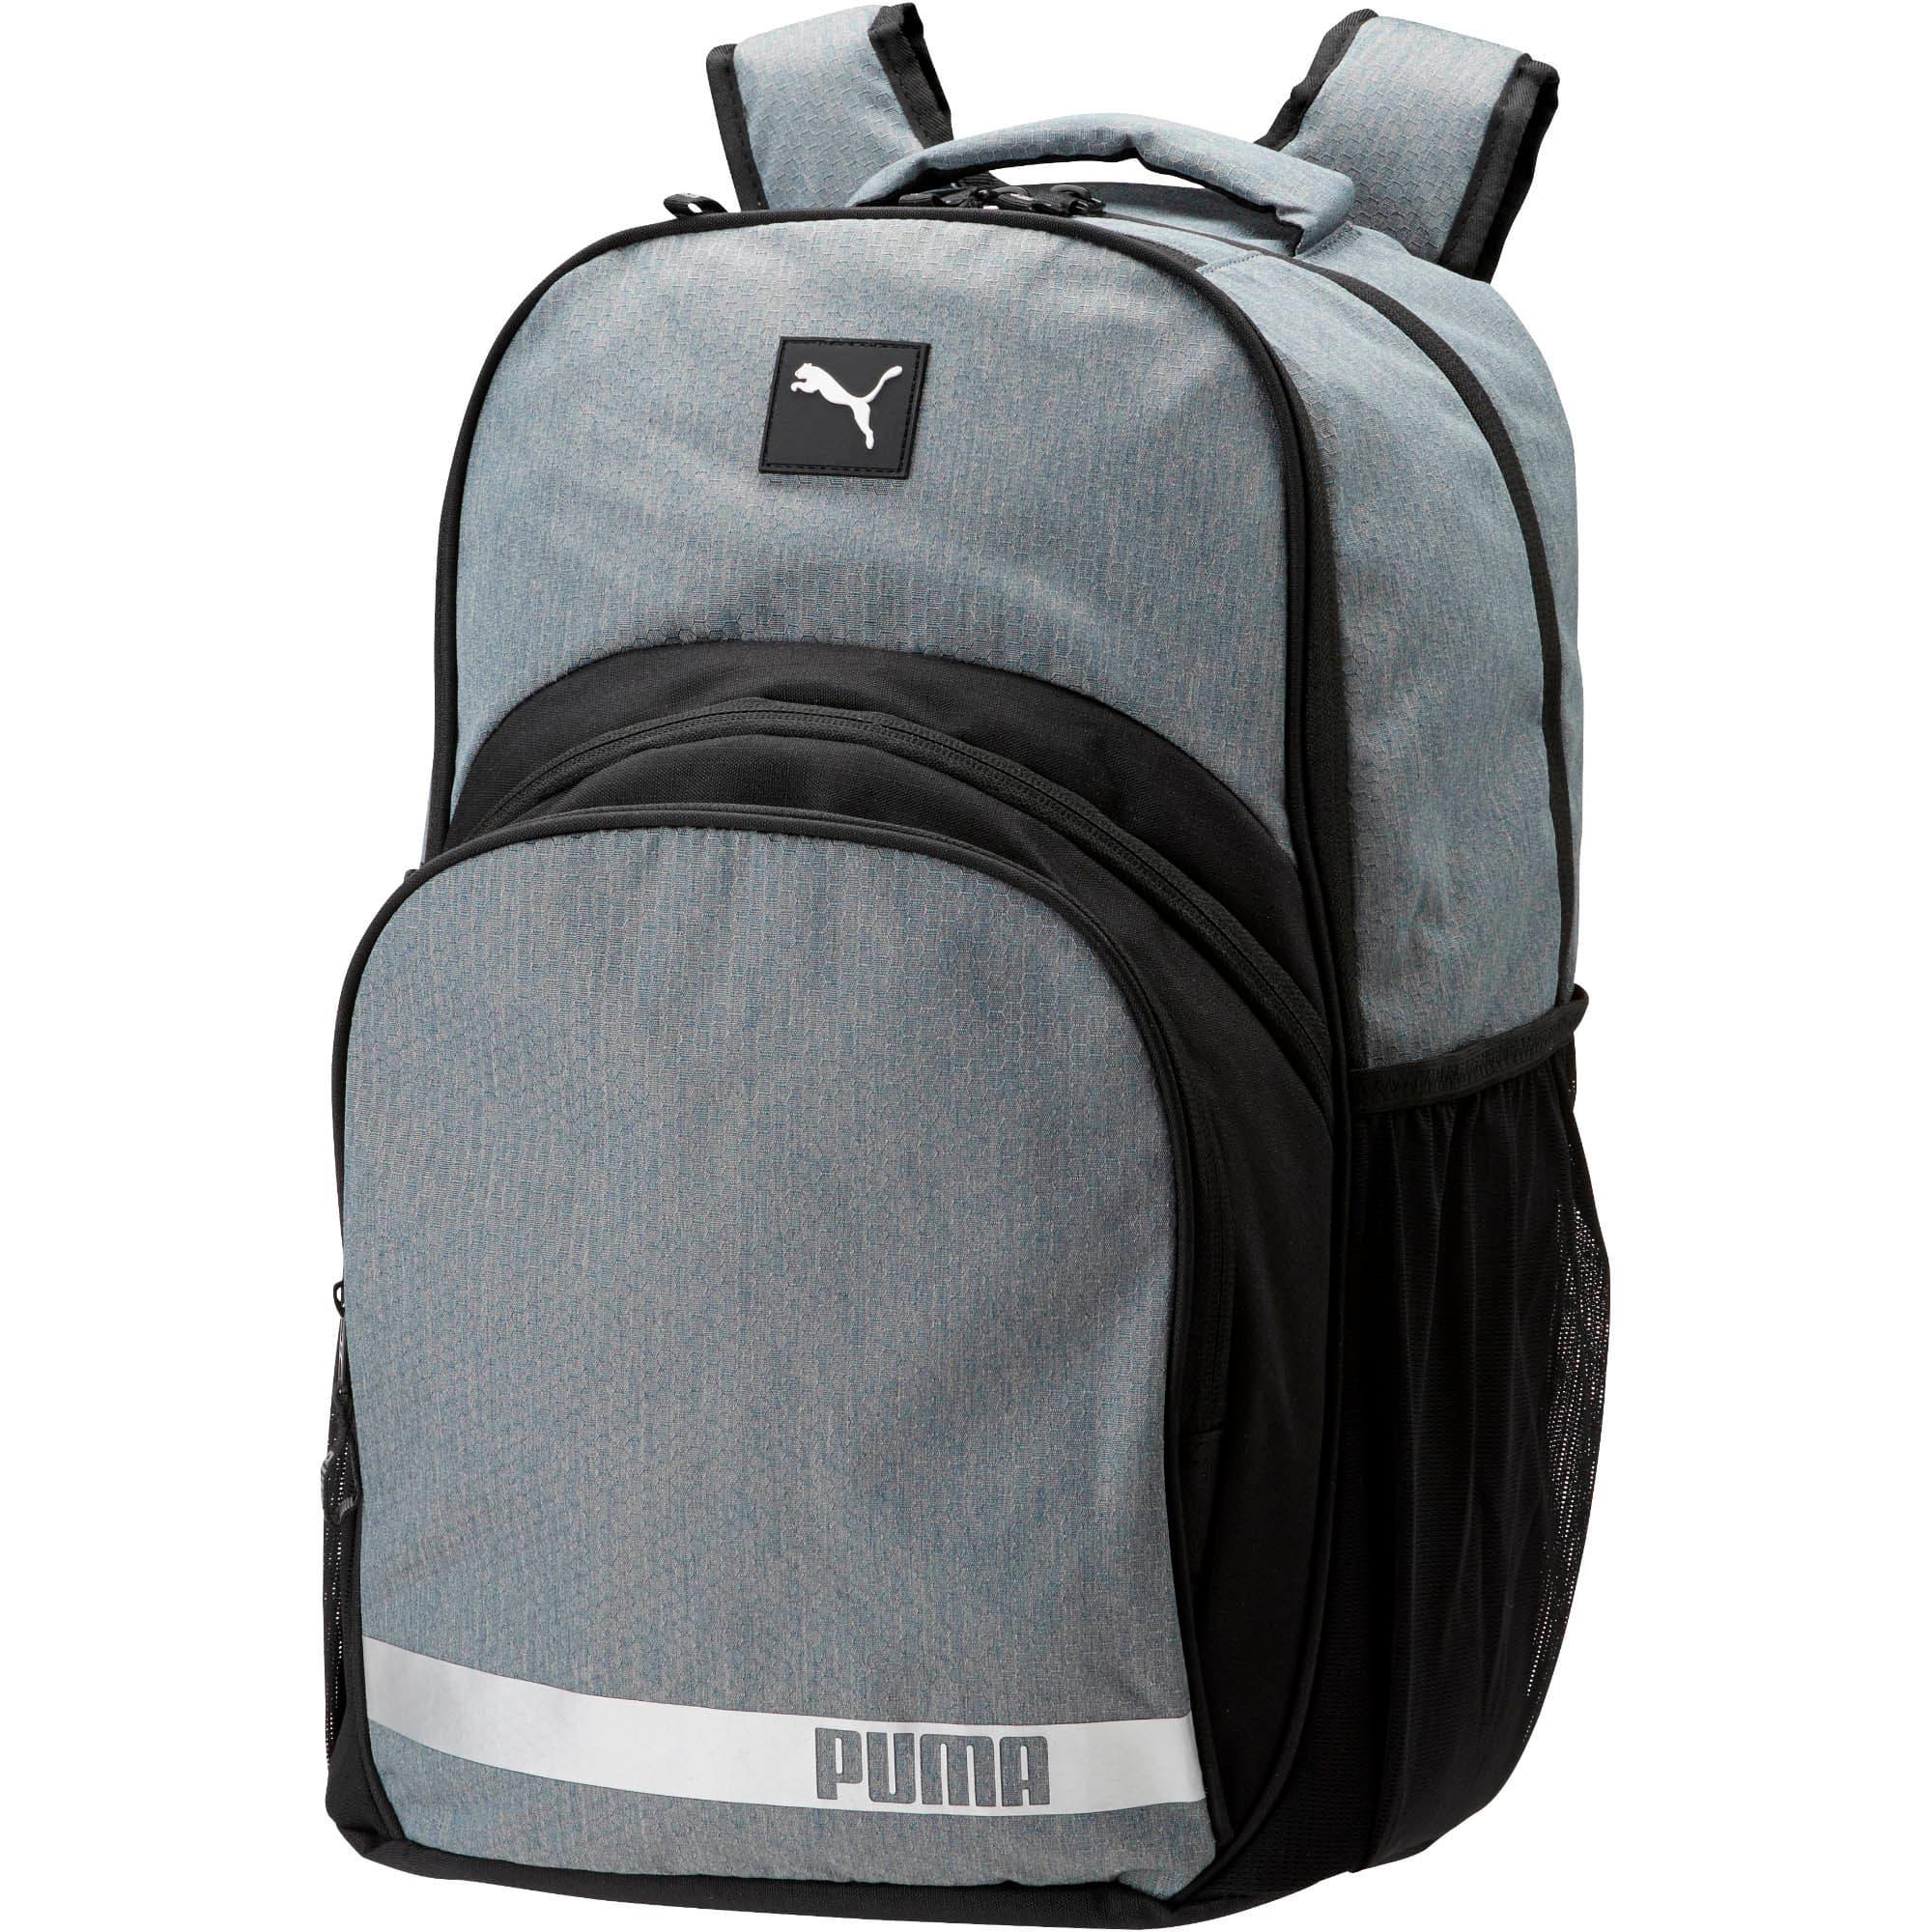 Thumbnail 1 of Formation 2.0 Ball Backpack, Grey/Black, medium